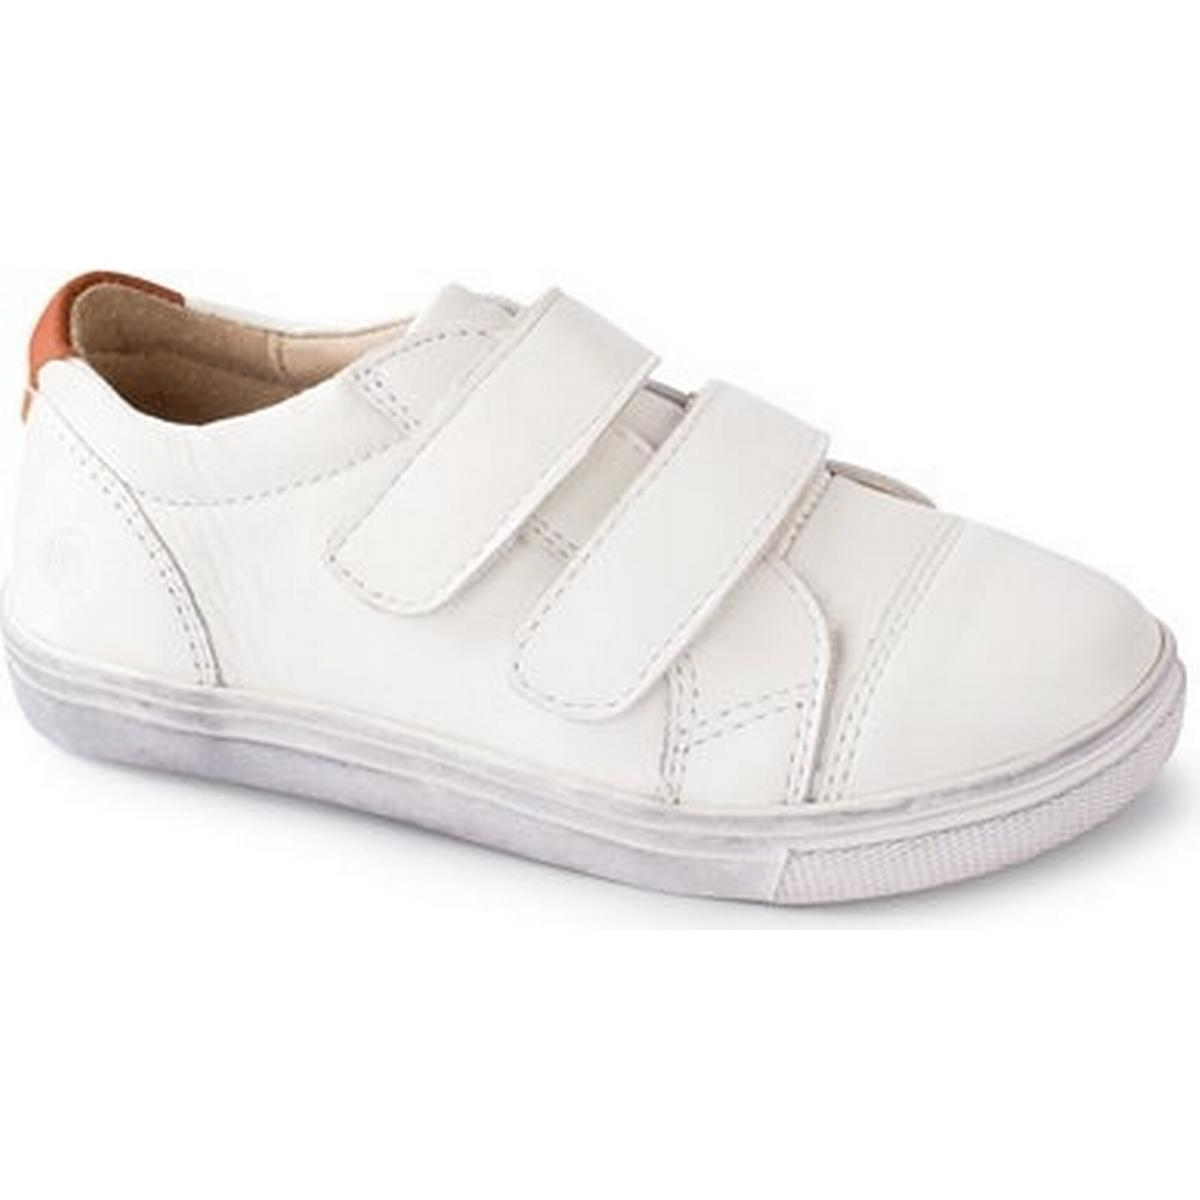 LED skorsneakers Barn SVARTA KARDBORRE st 27 34